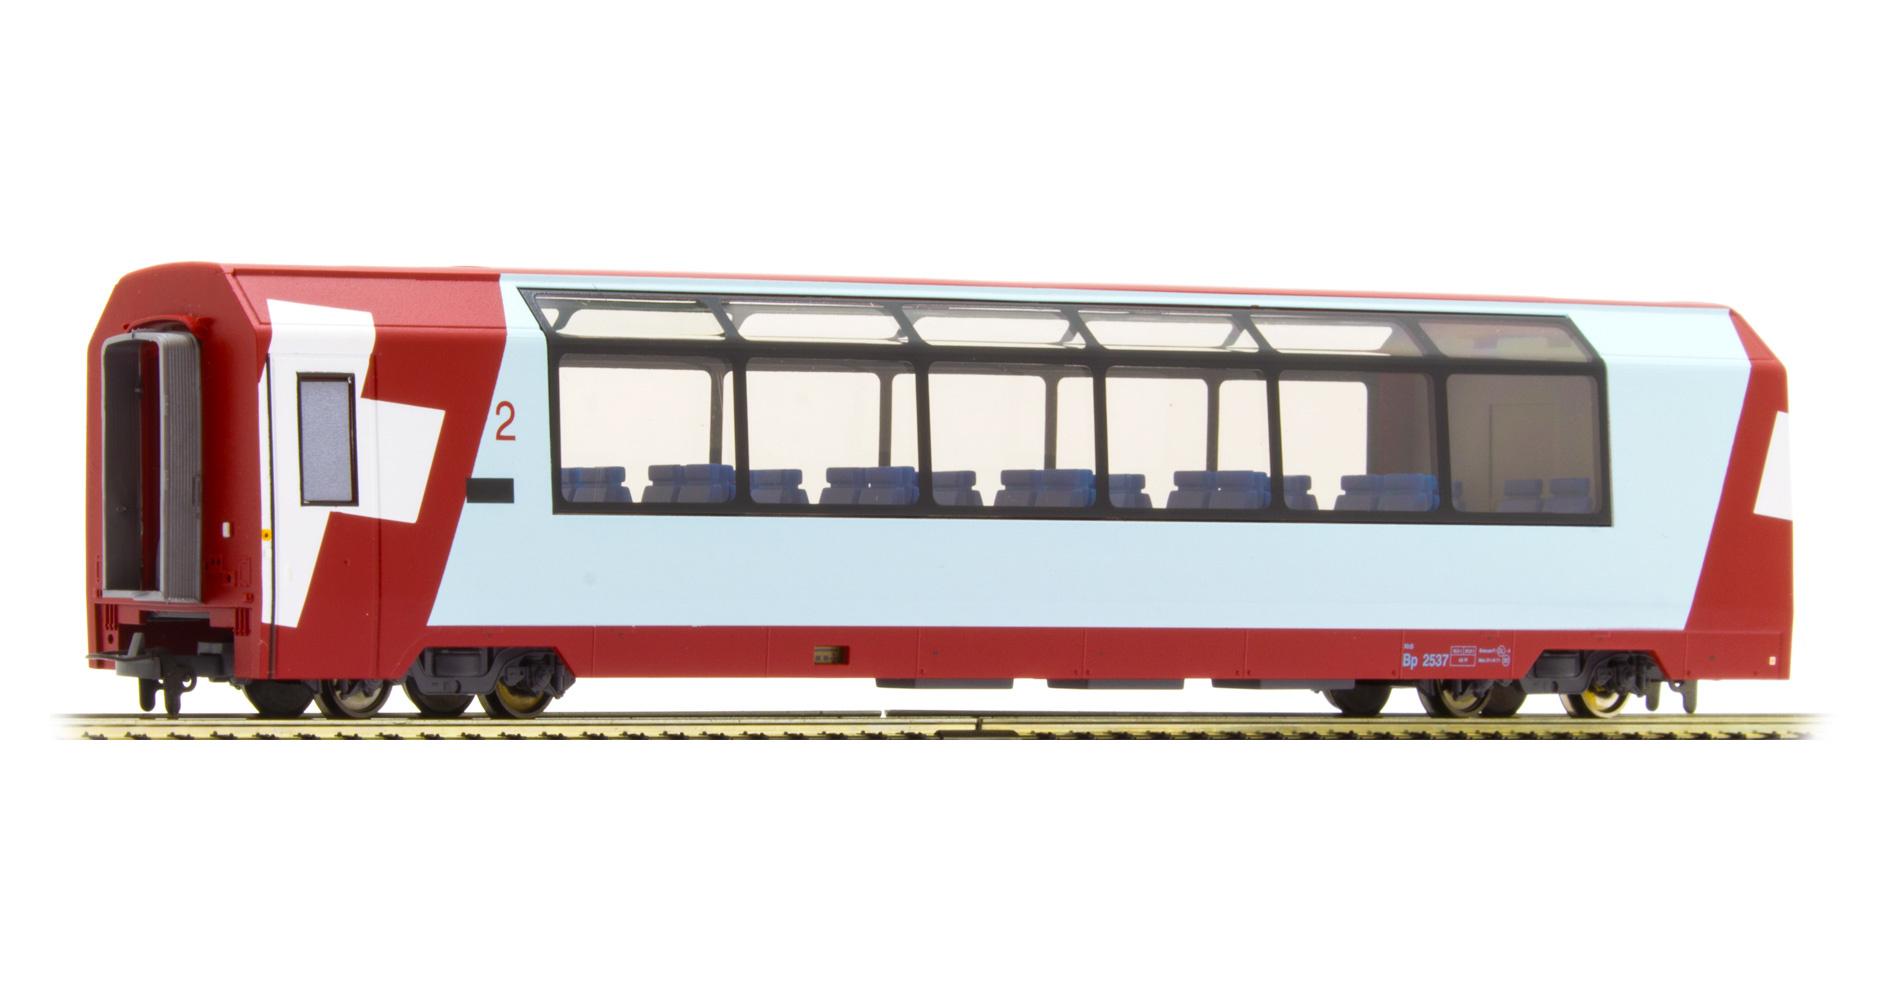 3289127 RhB Bp 2537 Panoramawagen GEX-1